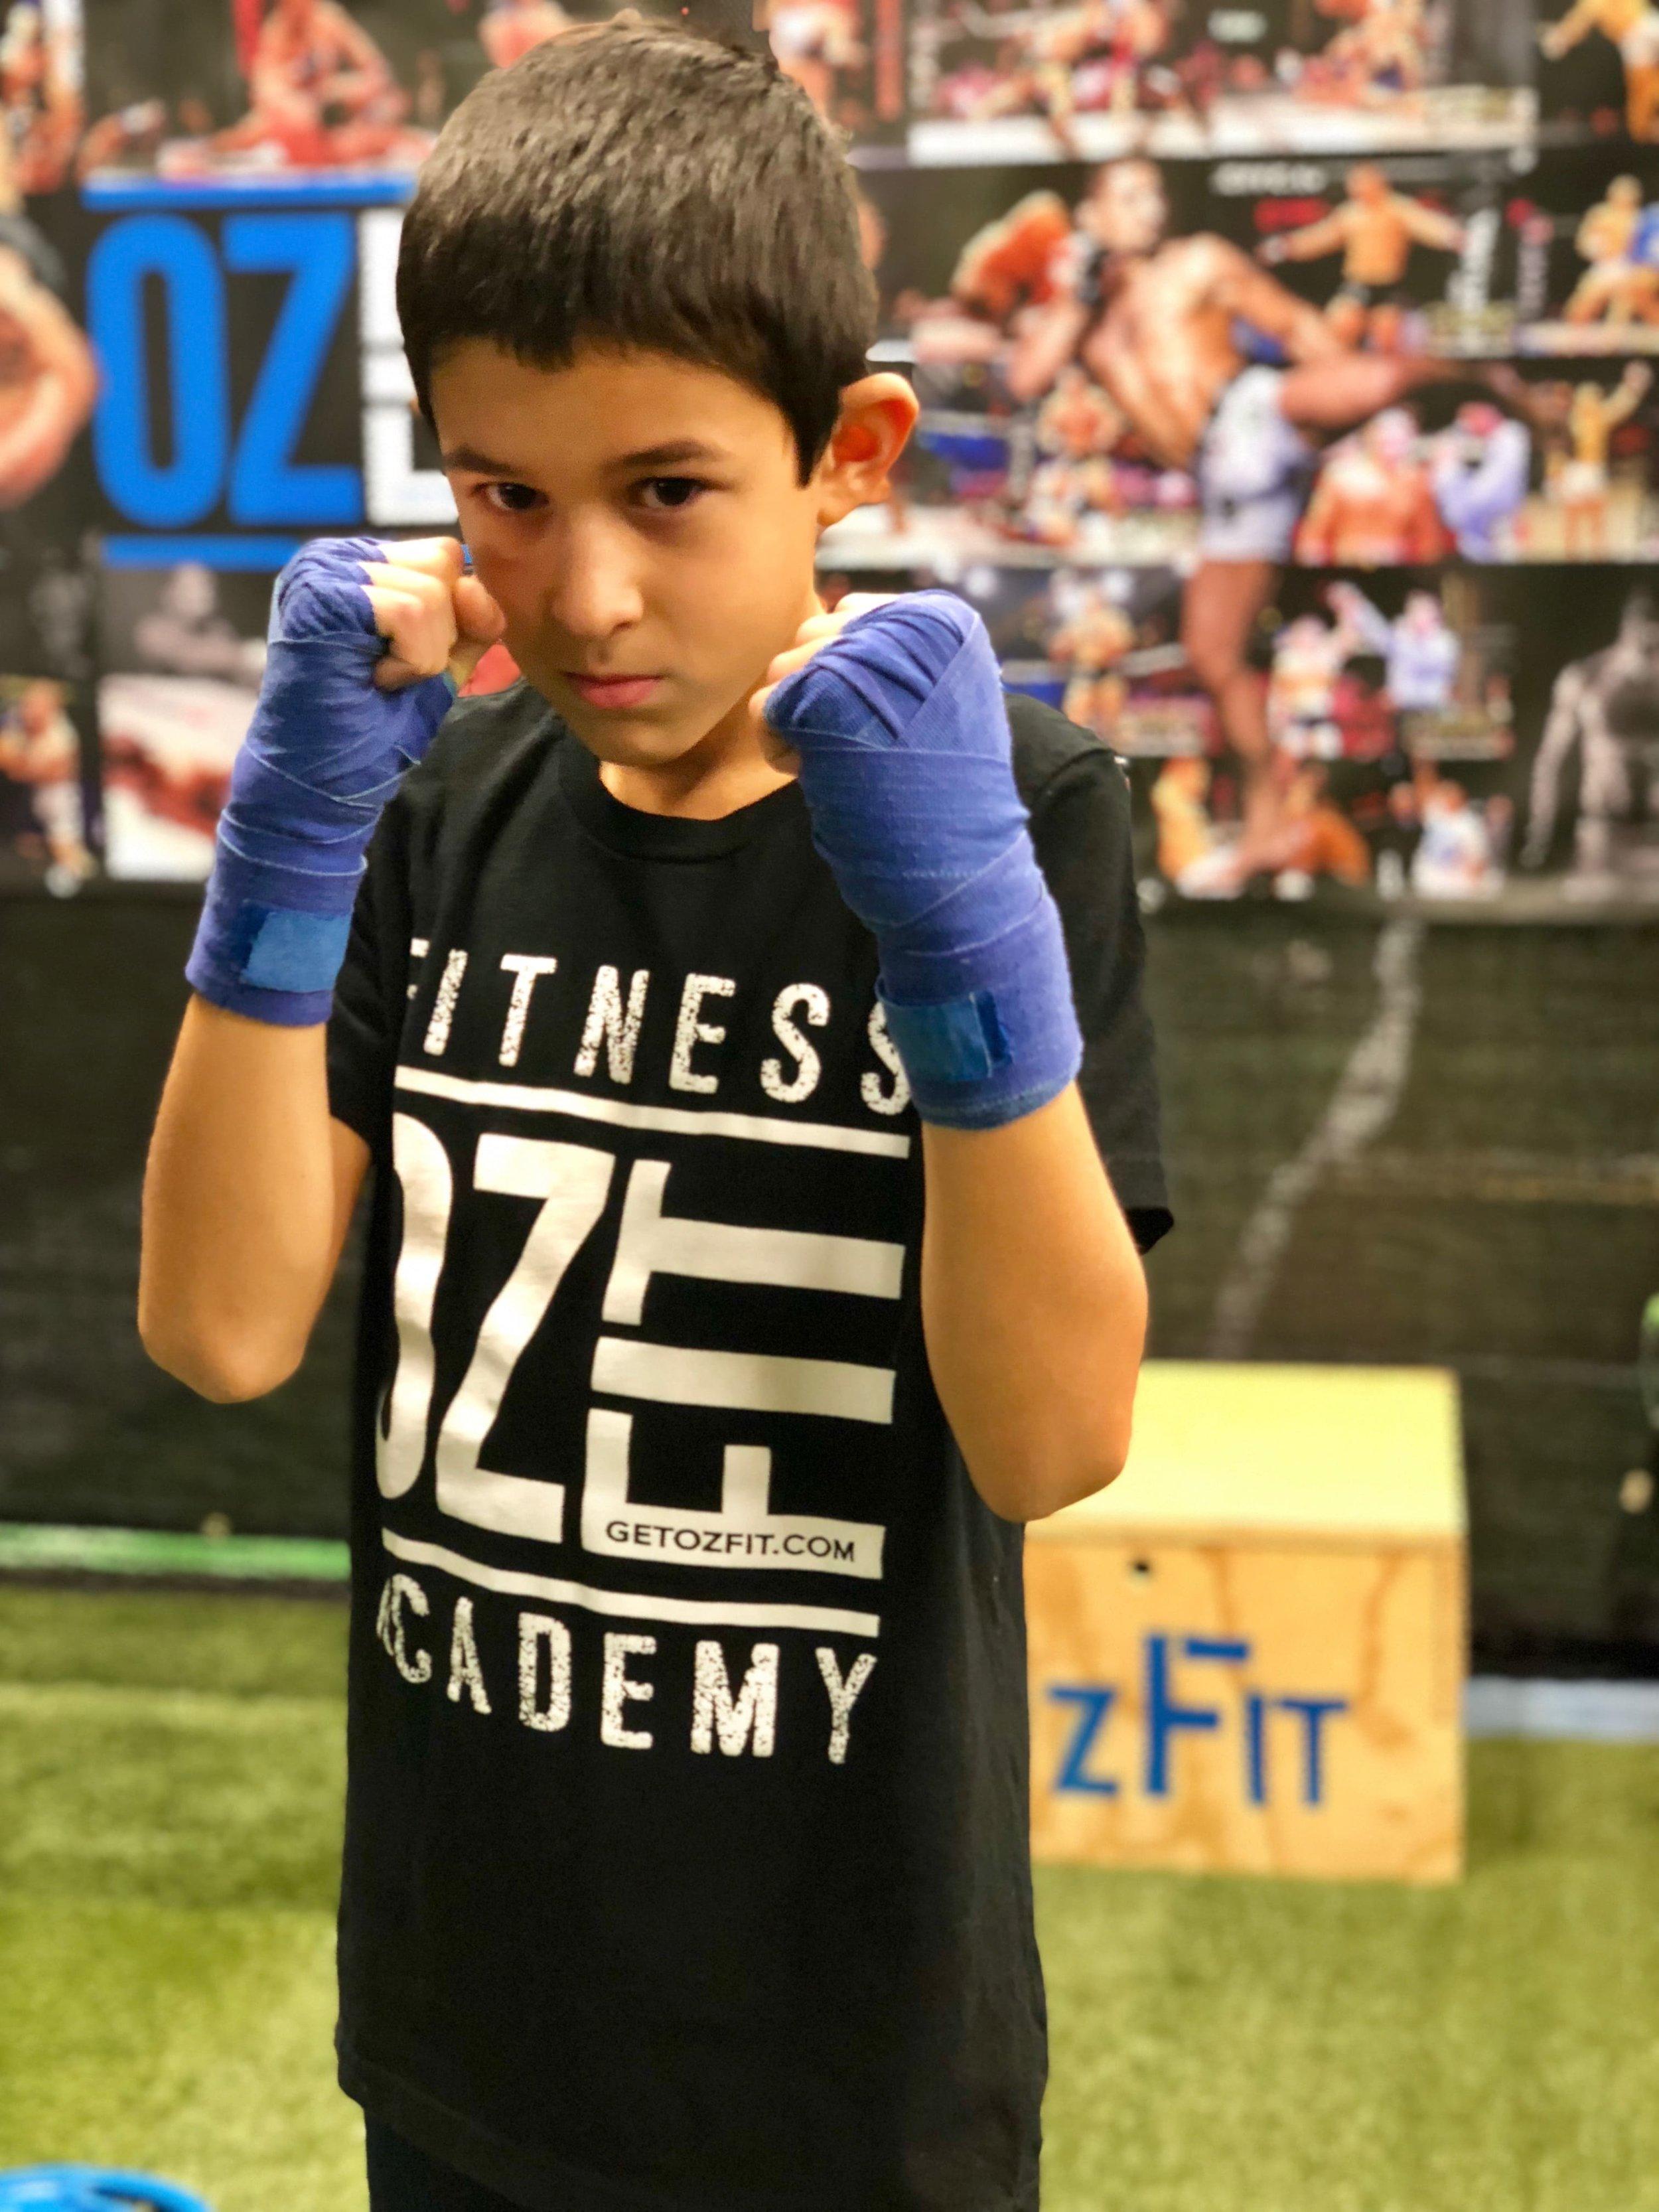 Get Oz Fit - Personal Trainer in Bergen County New Jersey - Ozzy Dugulubgov - Kids Training - Youth Fitness Program NJ (5)-min.jpeg